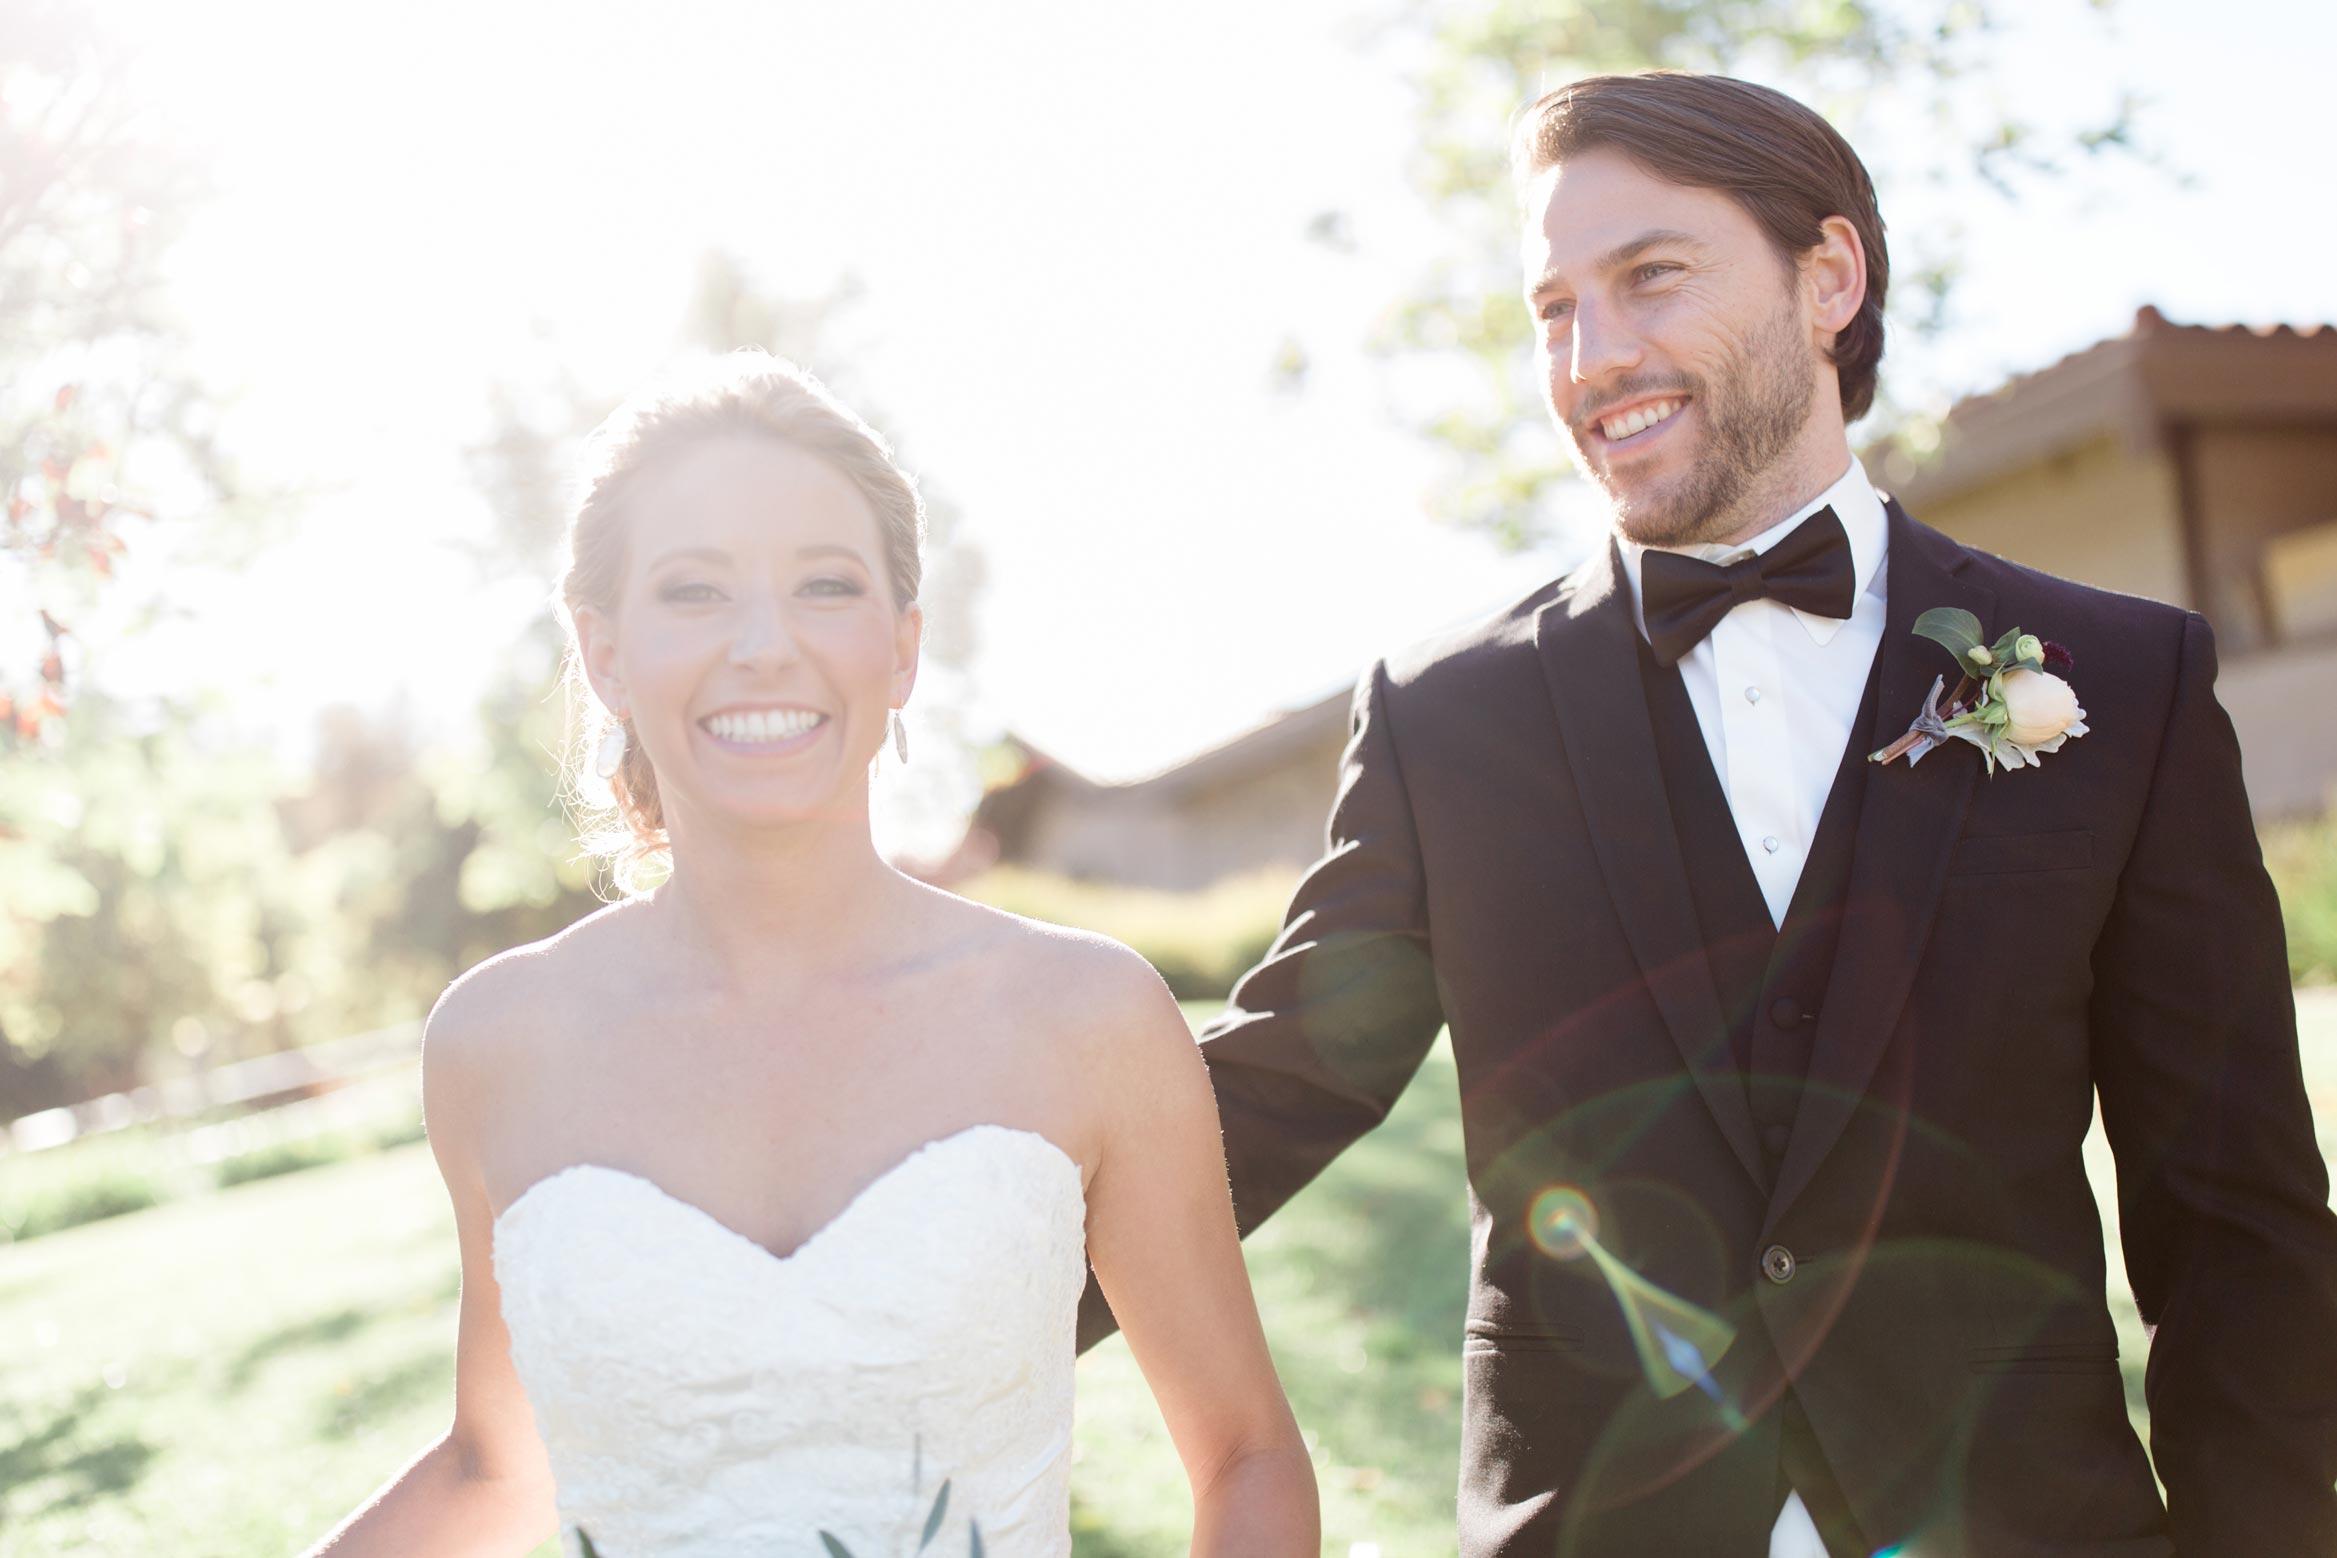 orange-county-fine-art-wedding-photographer-leah-vis-23.jpg